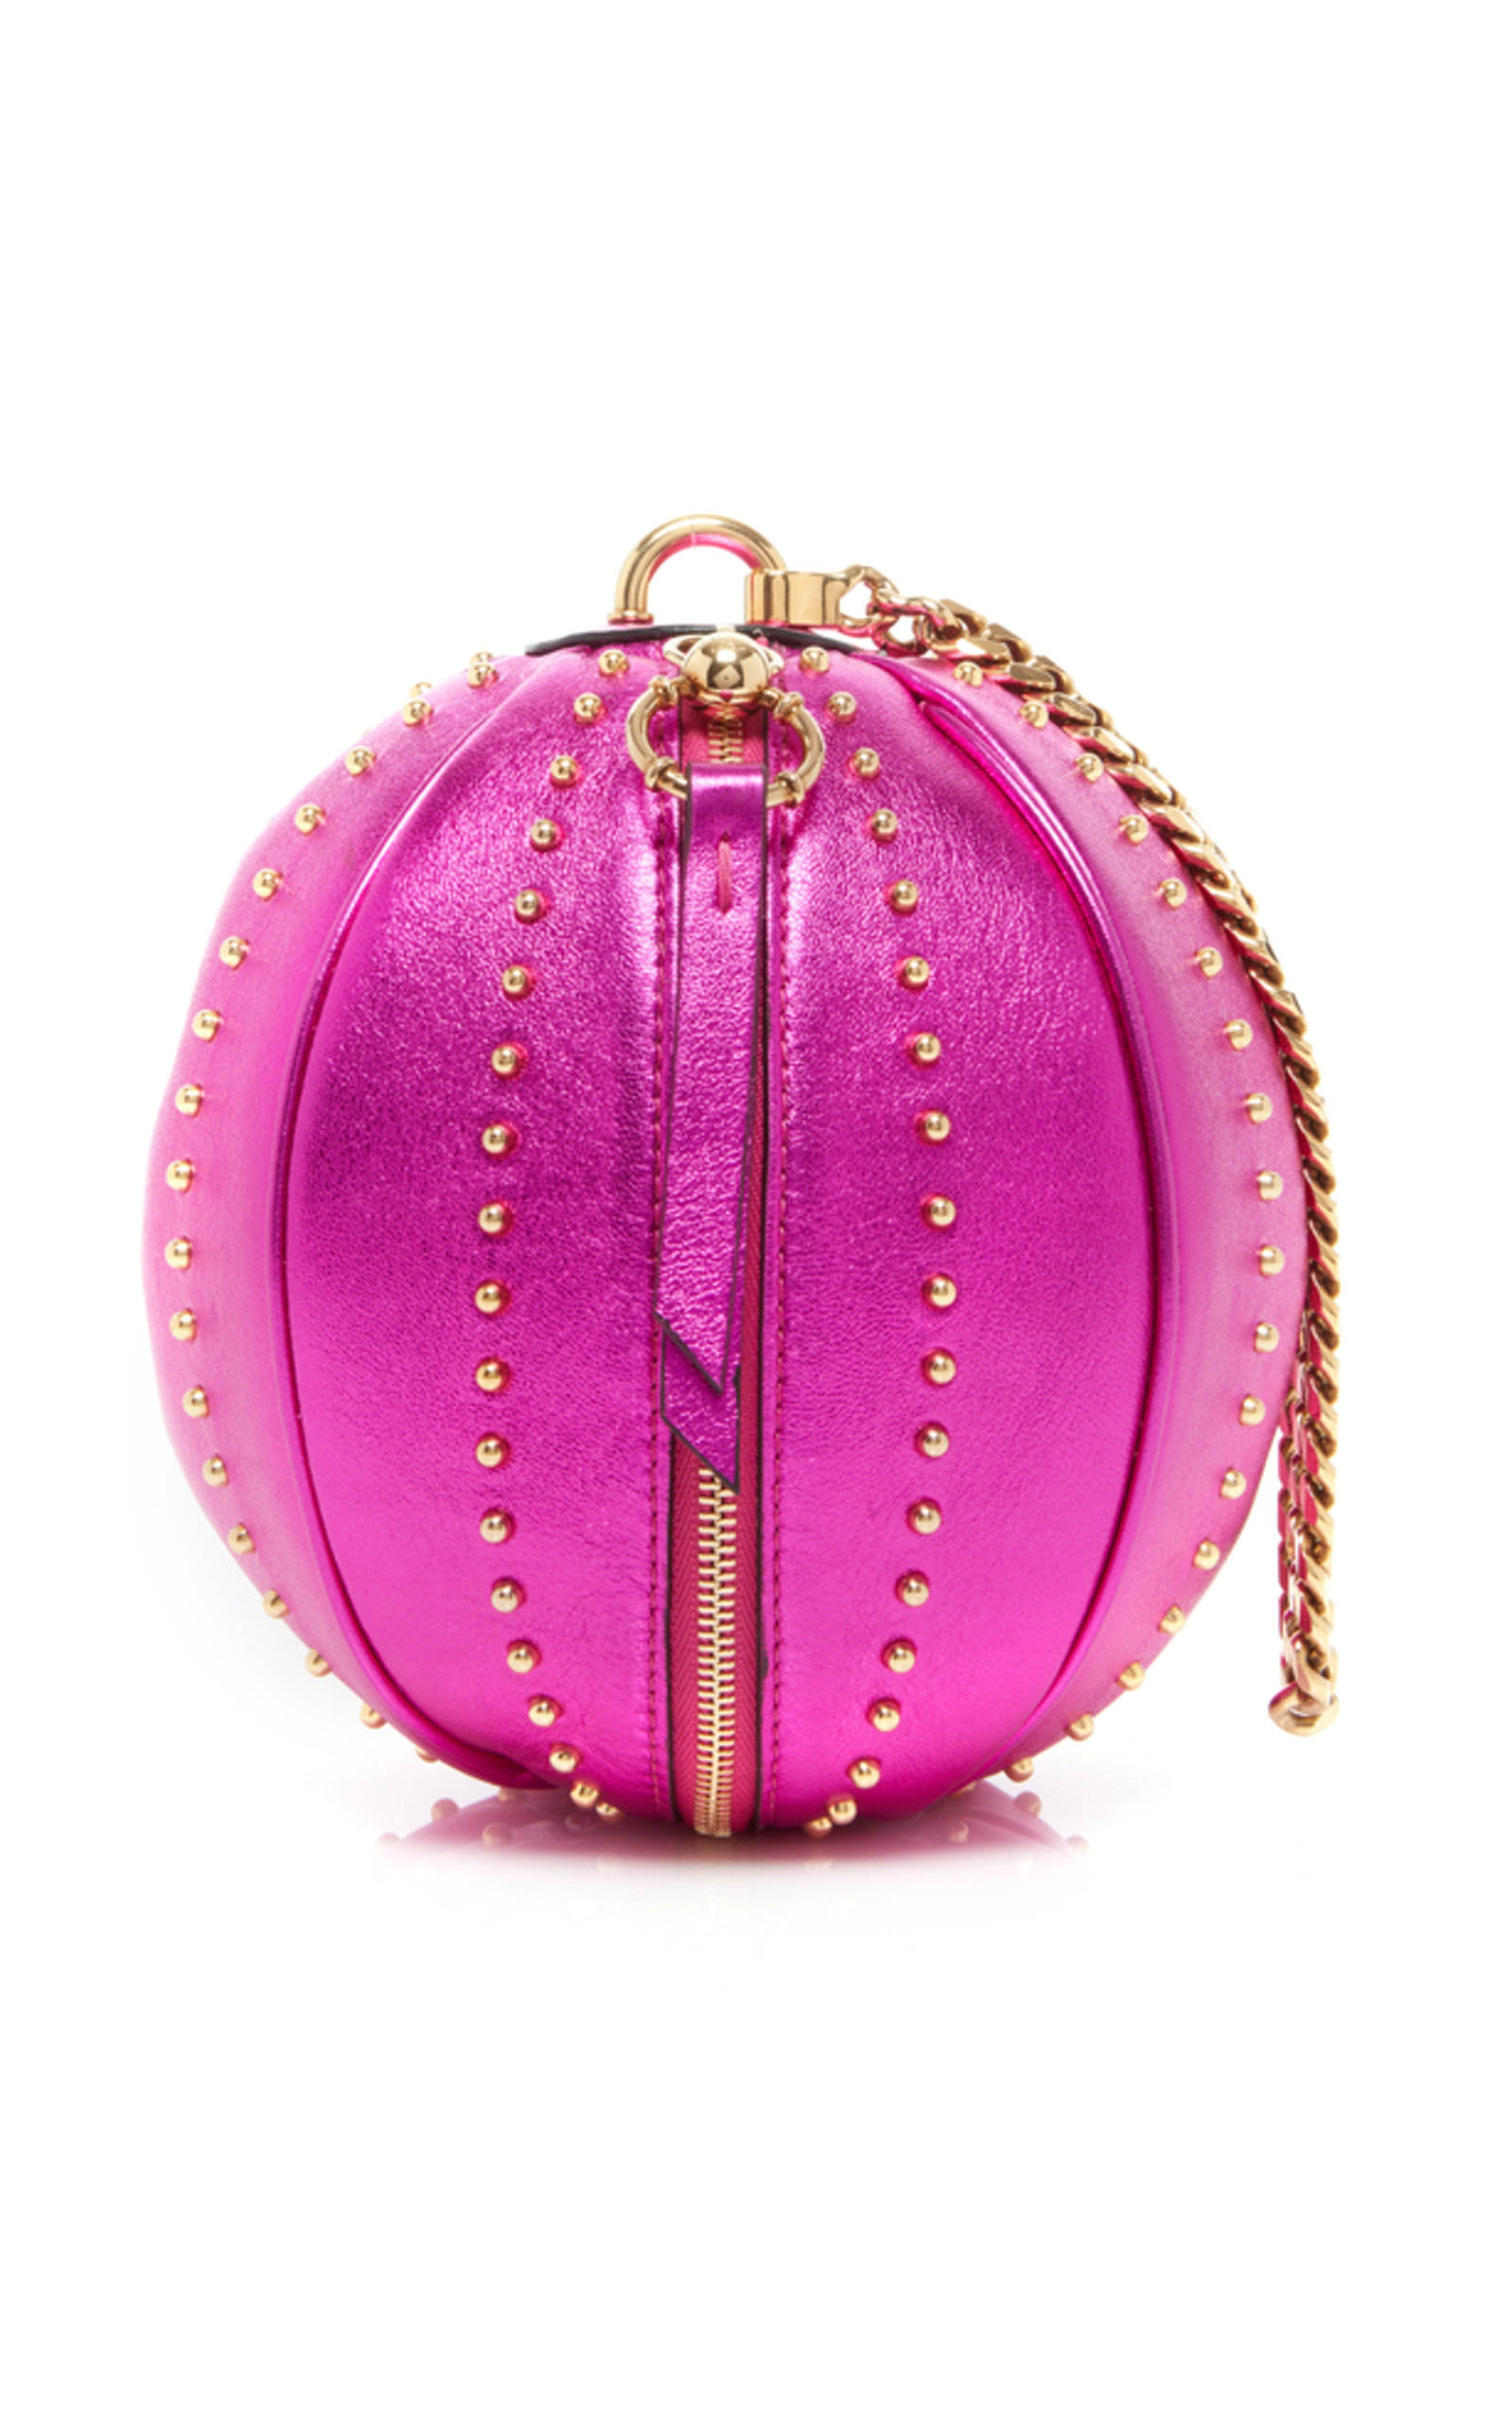 5dac4bcfea5 Balmain Laminated Lambskin Mini Moon Bag In Pink | ModeSens